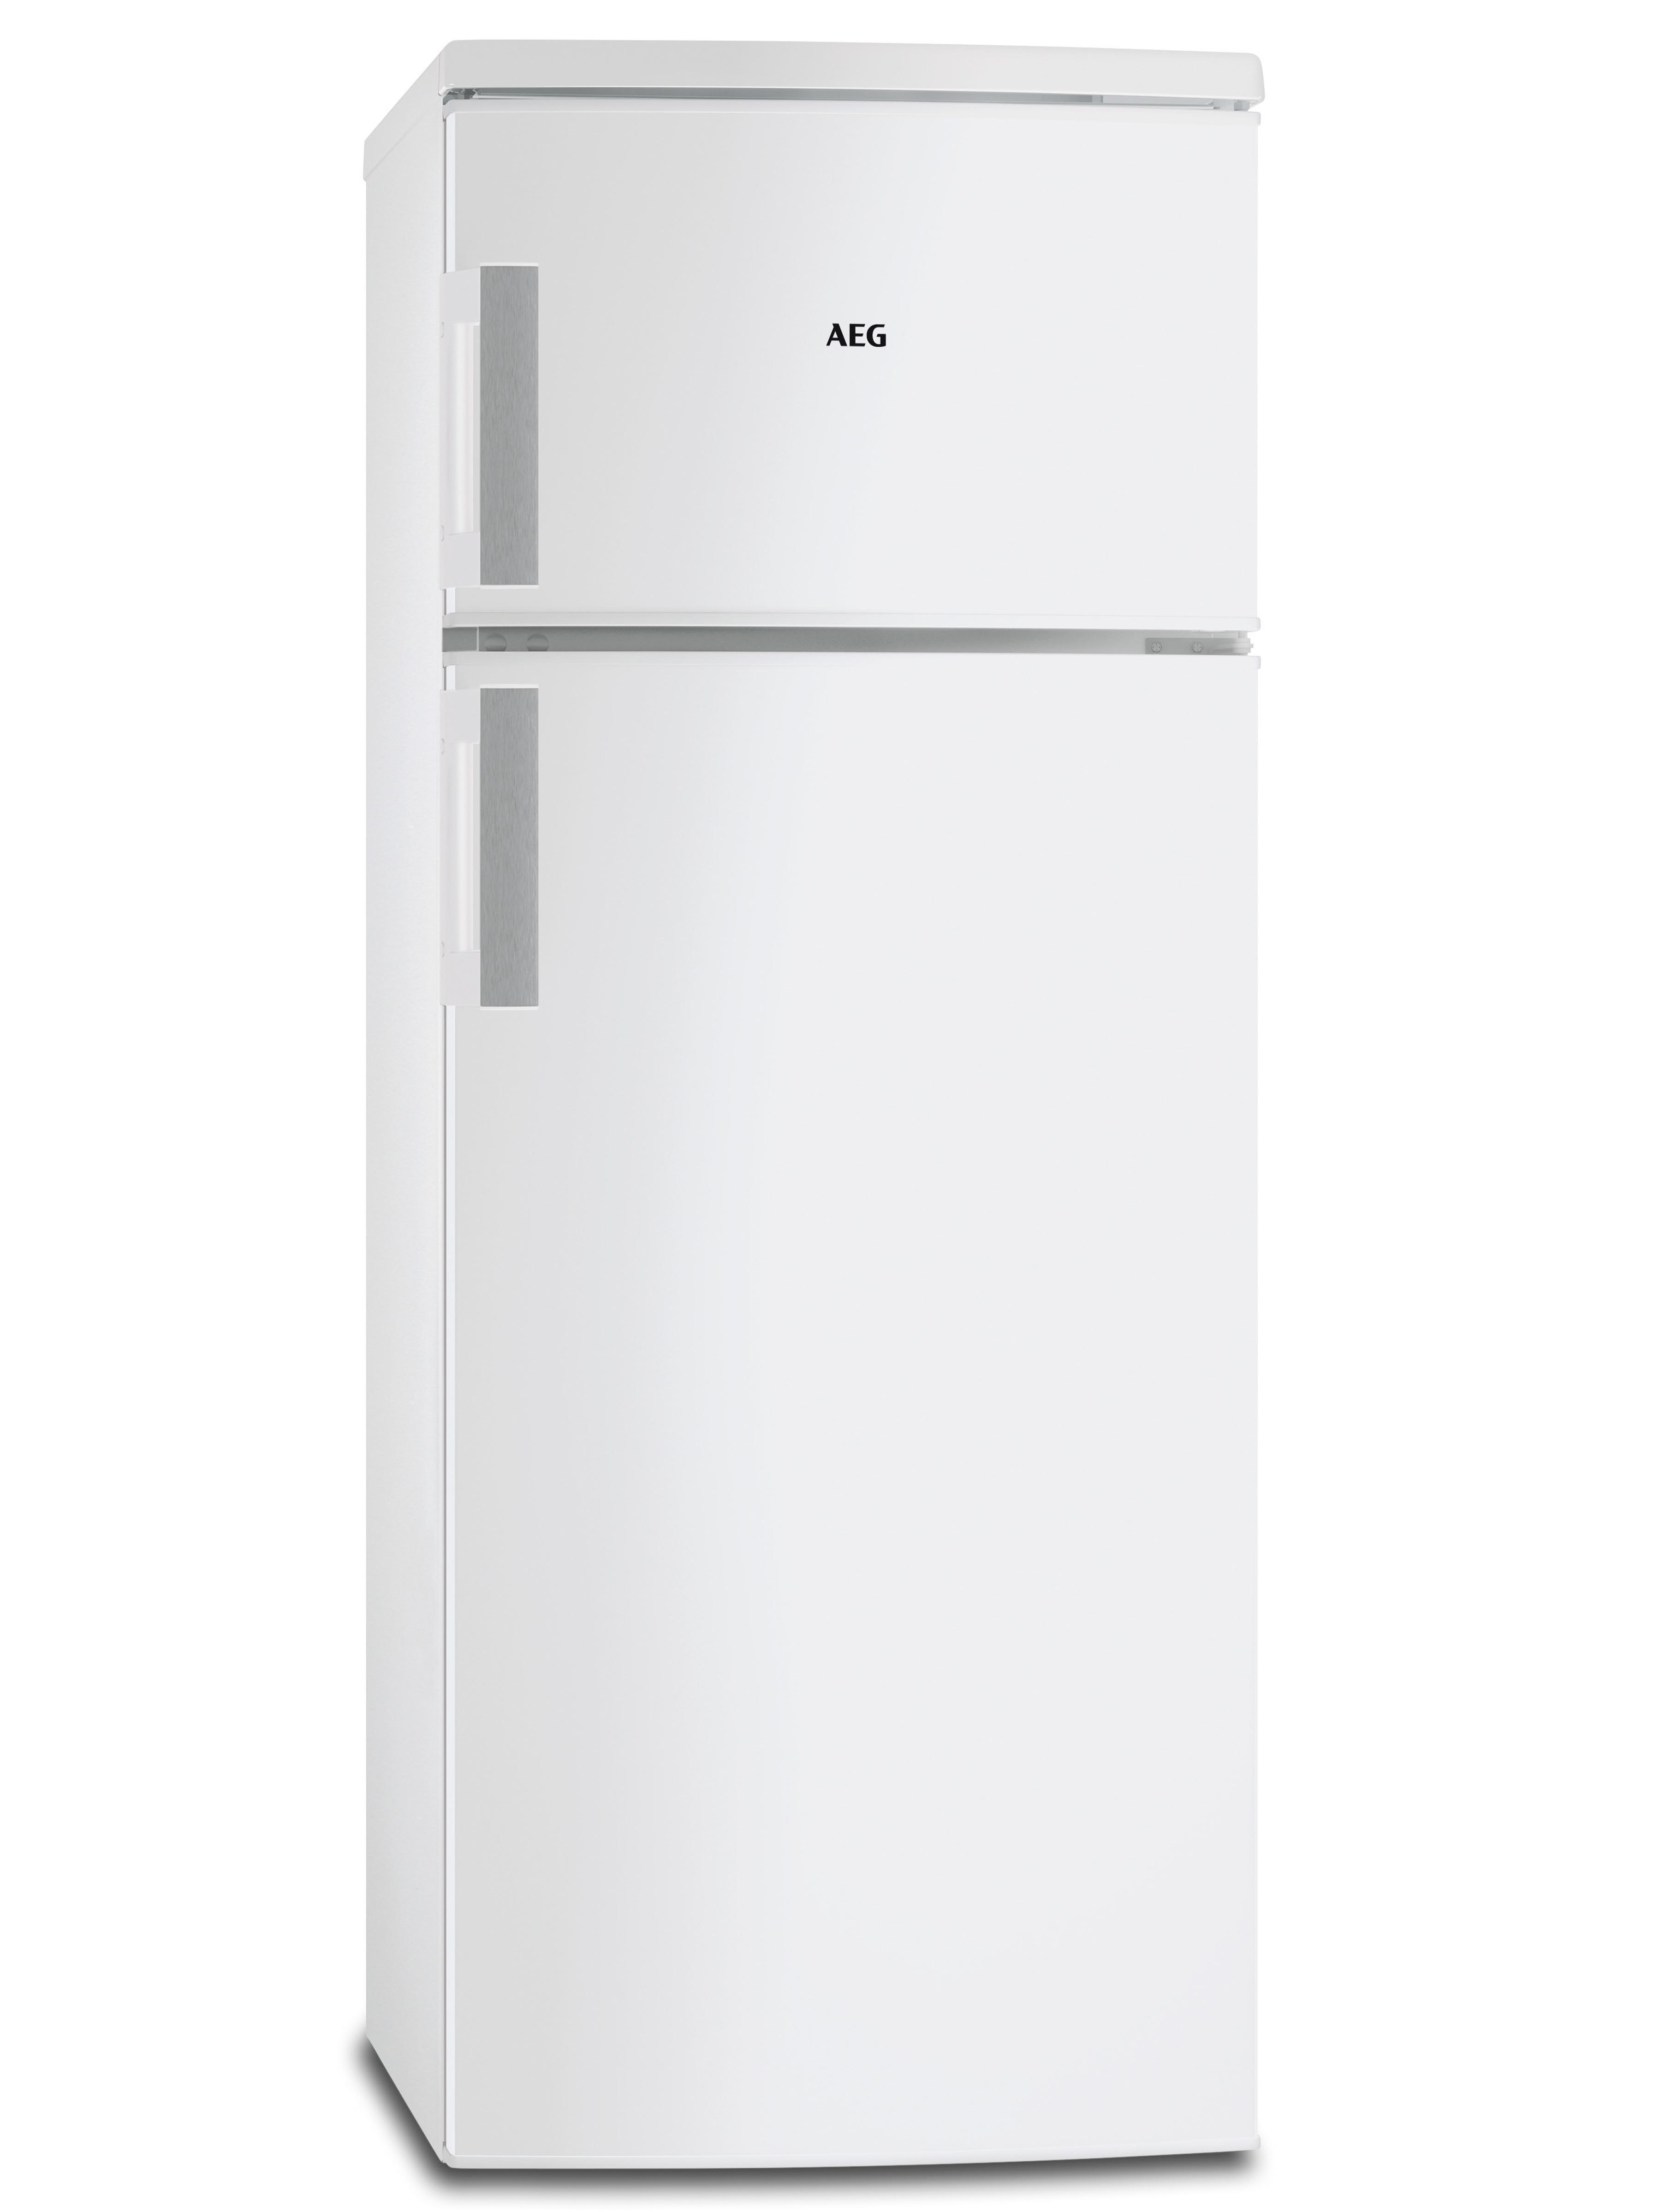 AEG koelkast met vriesvak RDB72321AW